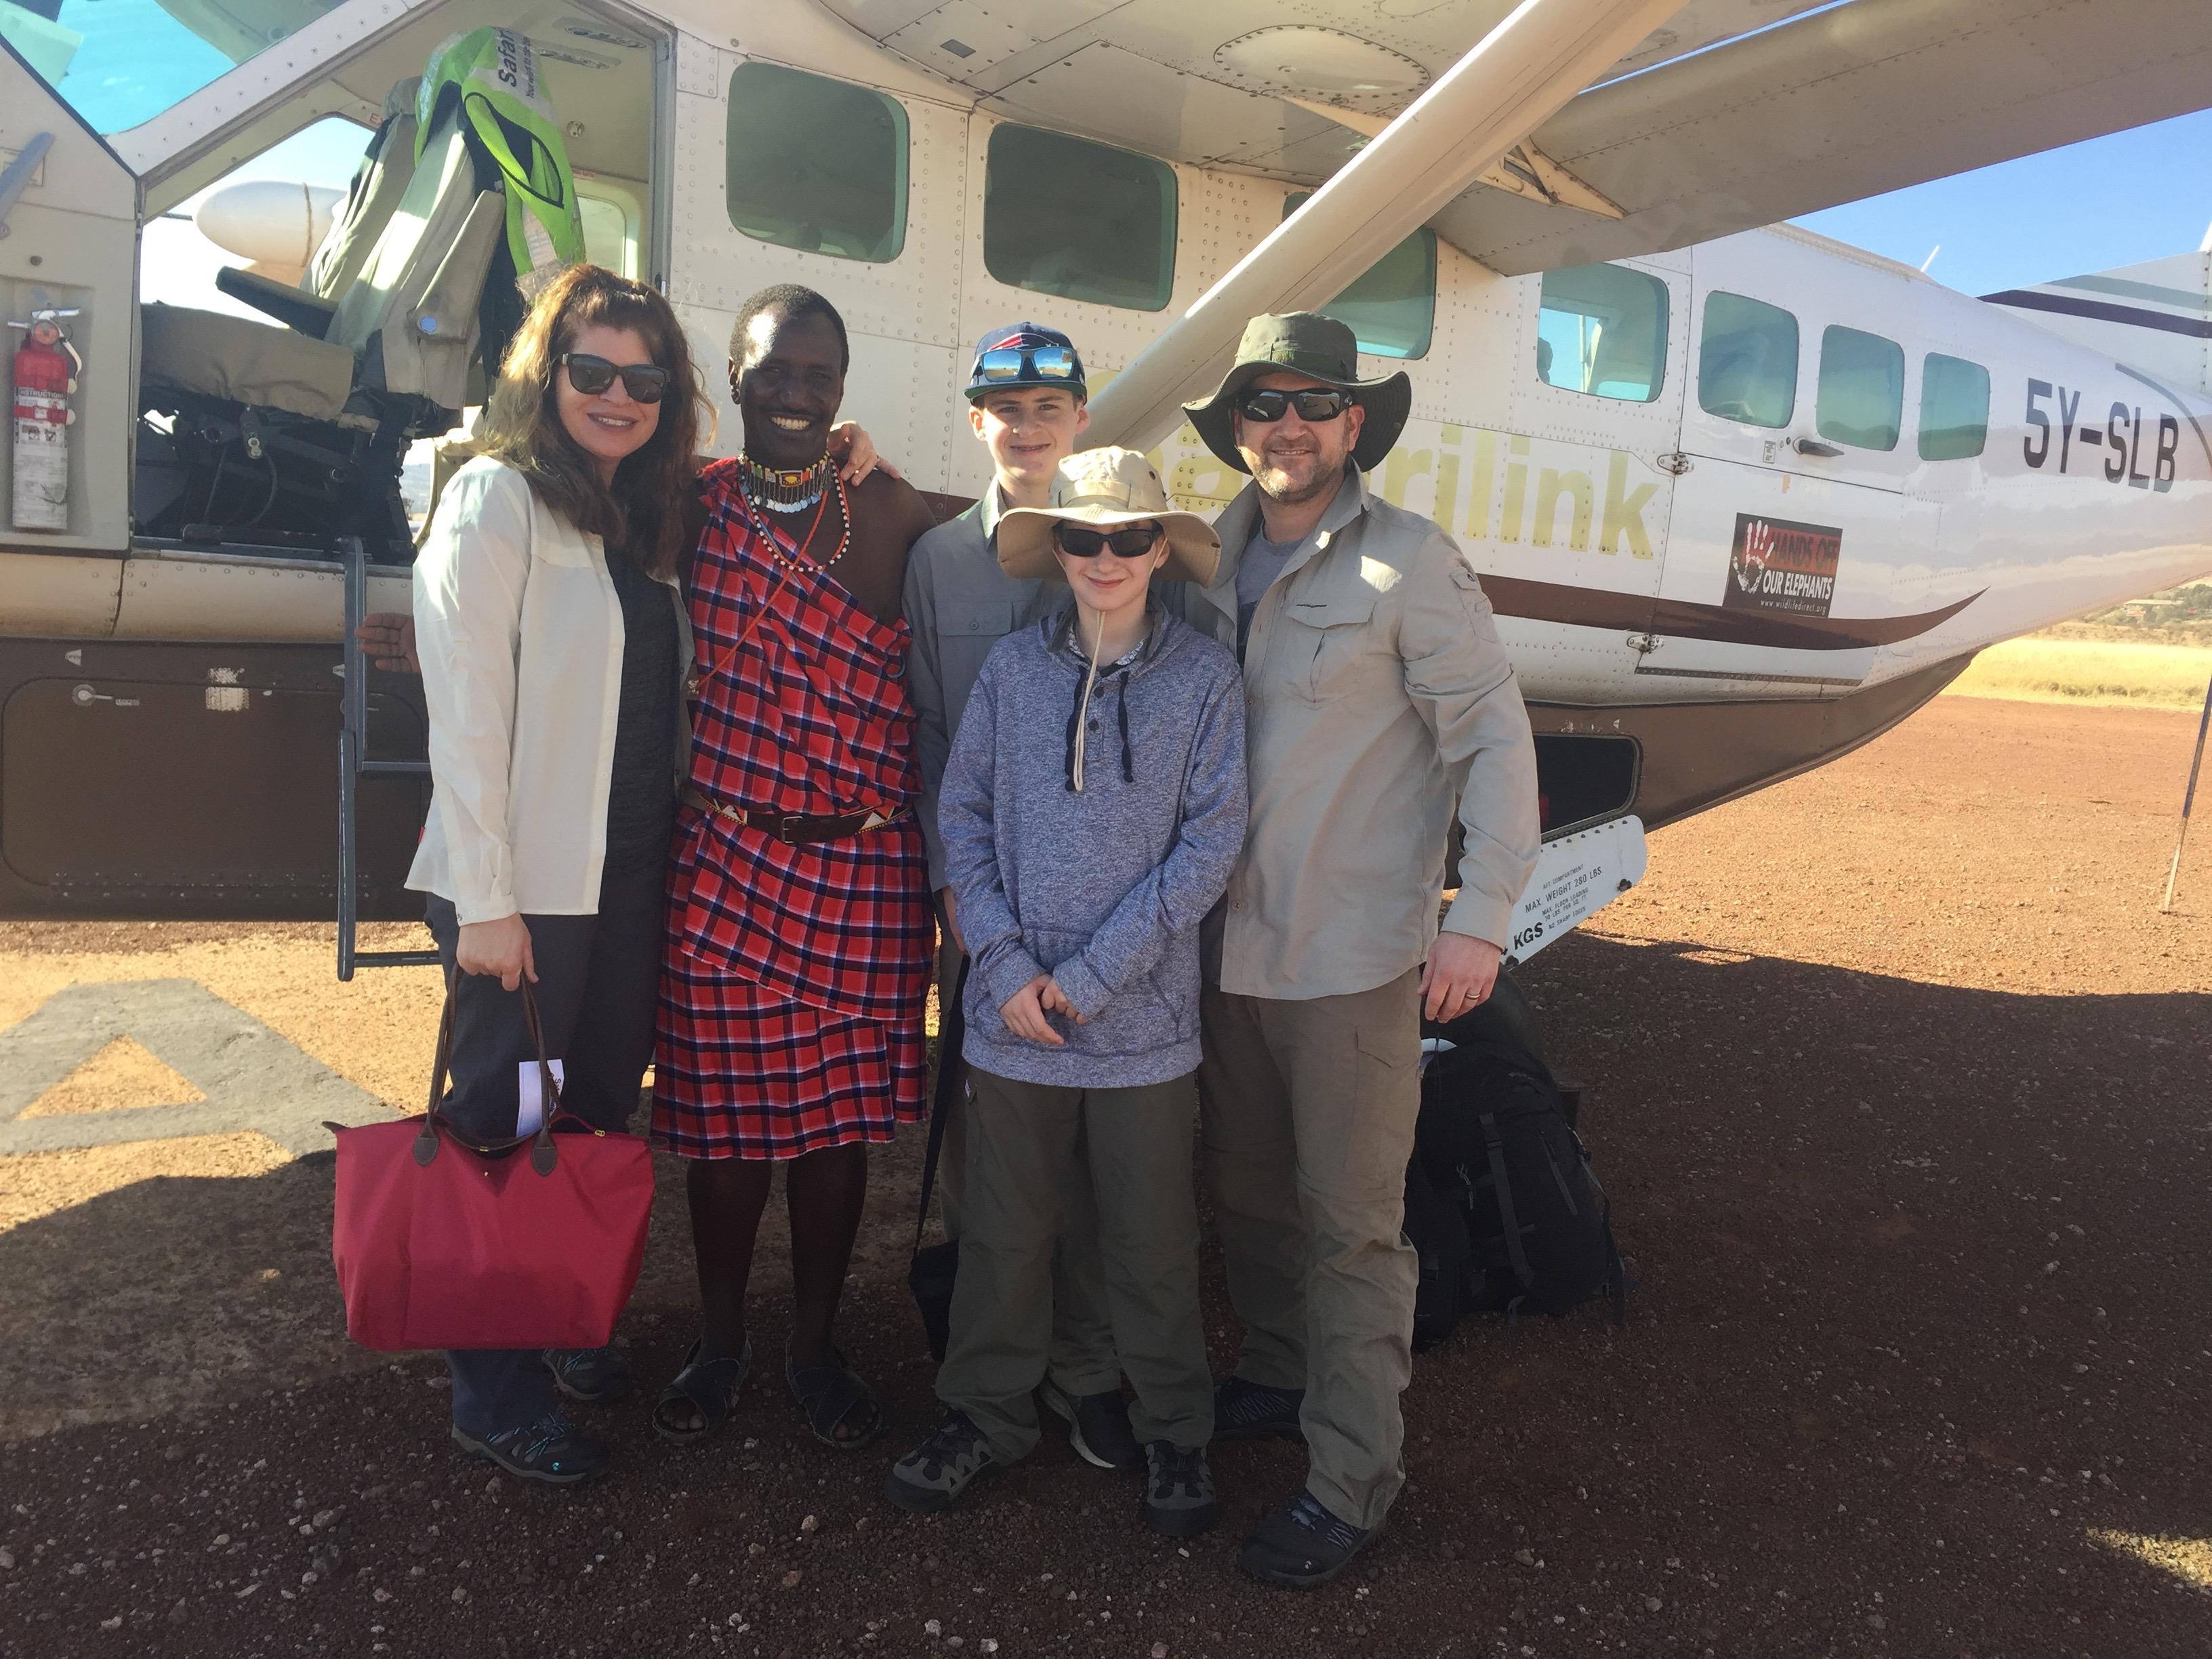 Marci-Beth African safari with family